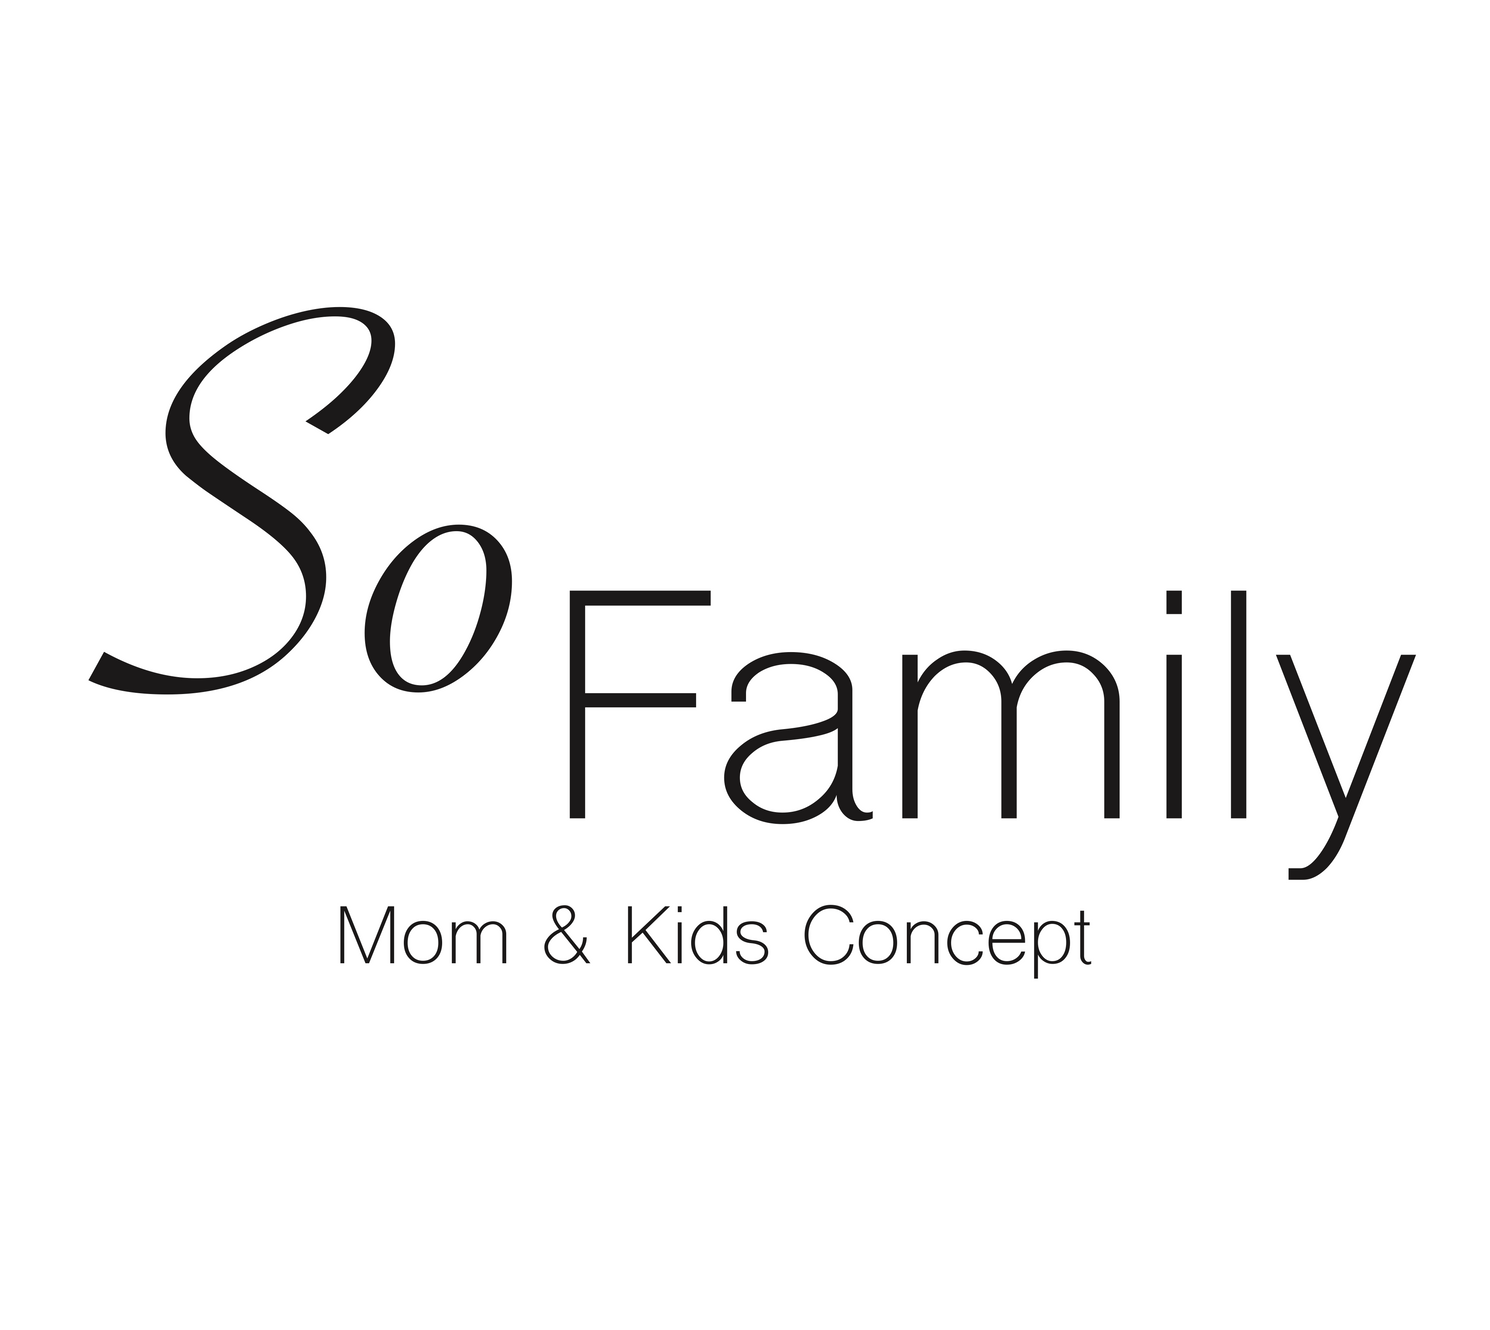 So Family